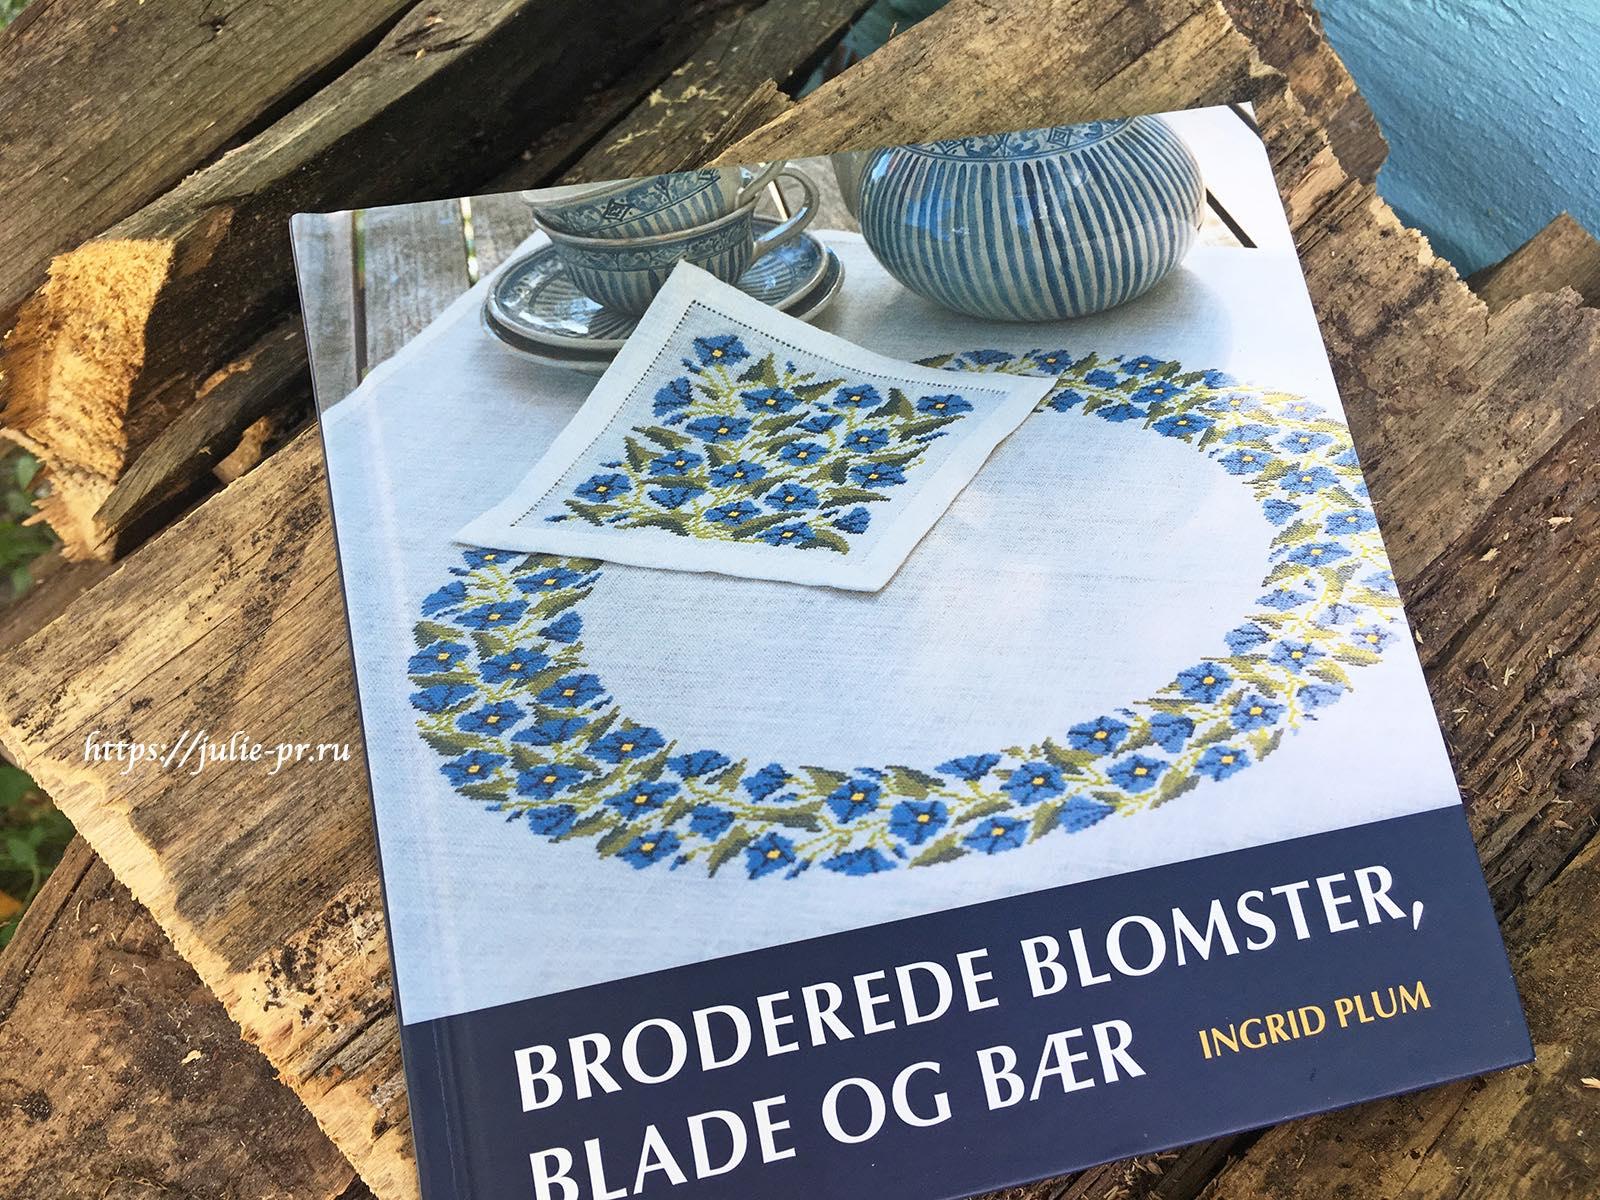 Датская книга по вышивке крестом Broderede blomster, blade og bær / Вышитые цветы, листья и ягоды Ingrid Plum